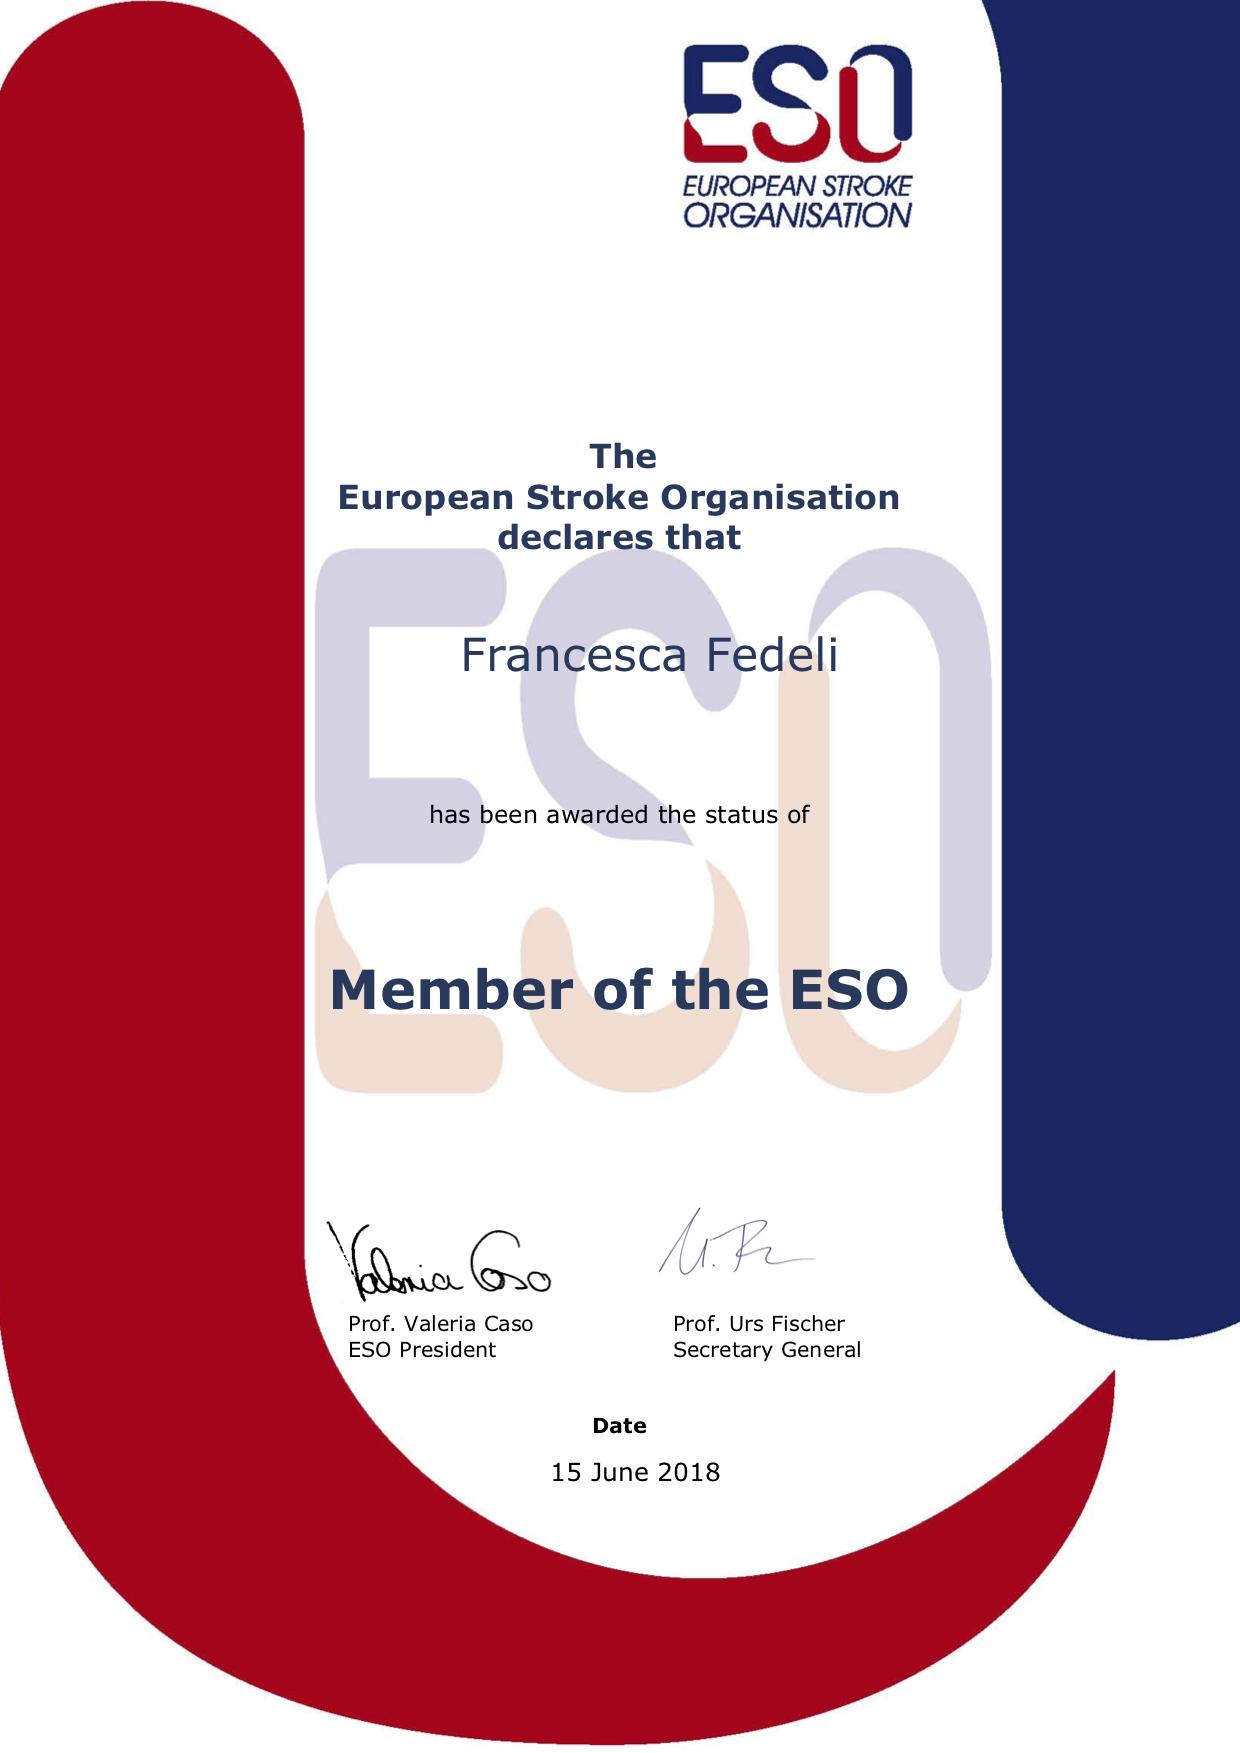 EuropeanStroke Organisation (ESO) Membership